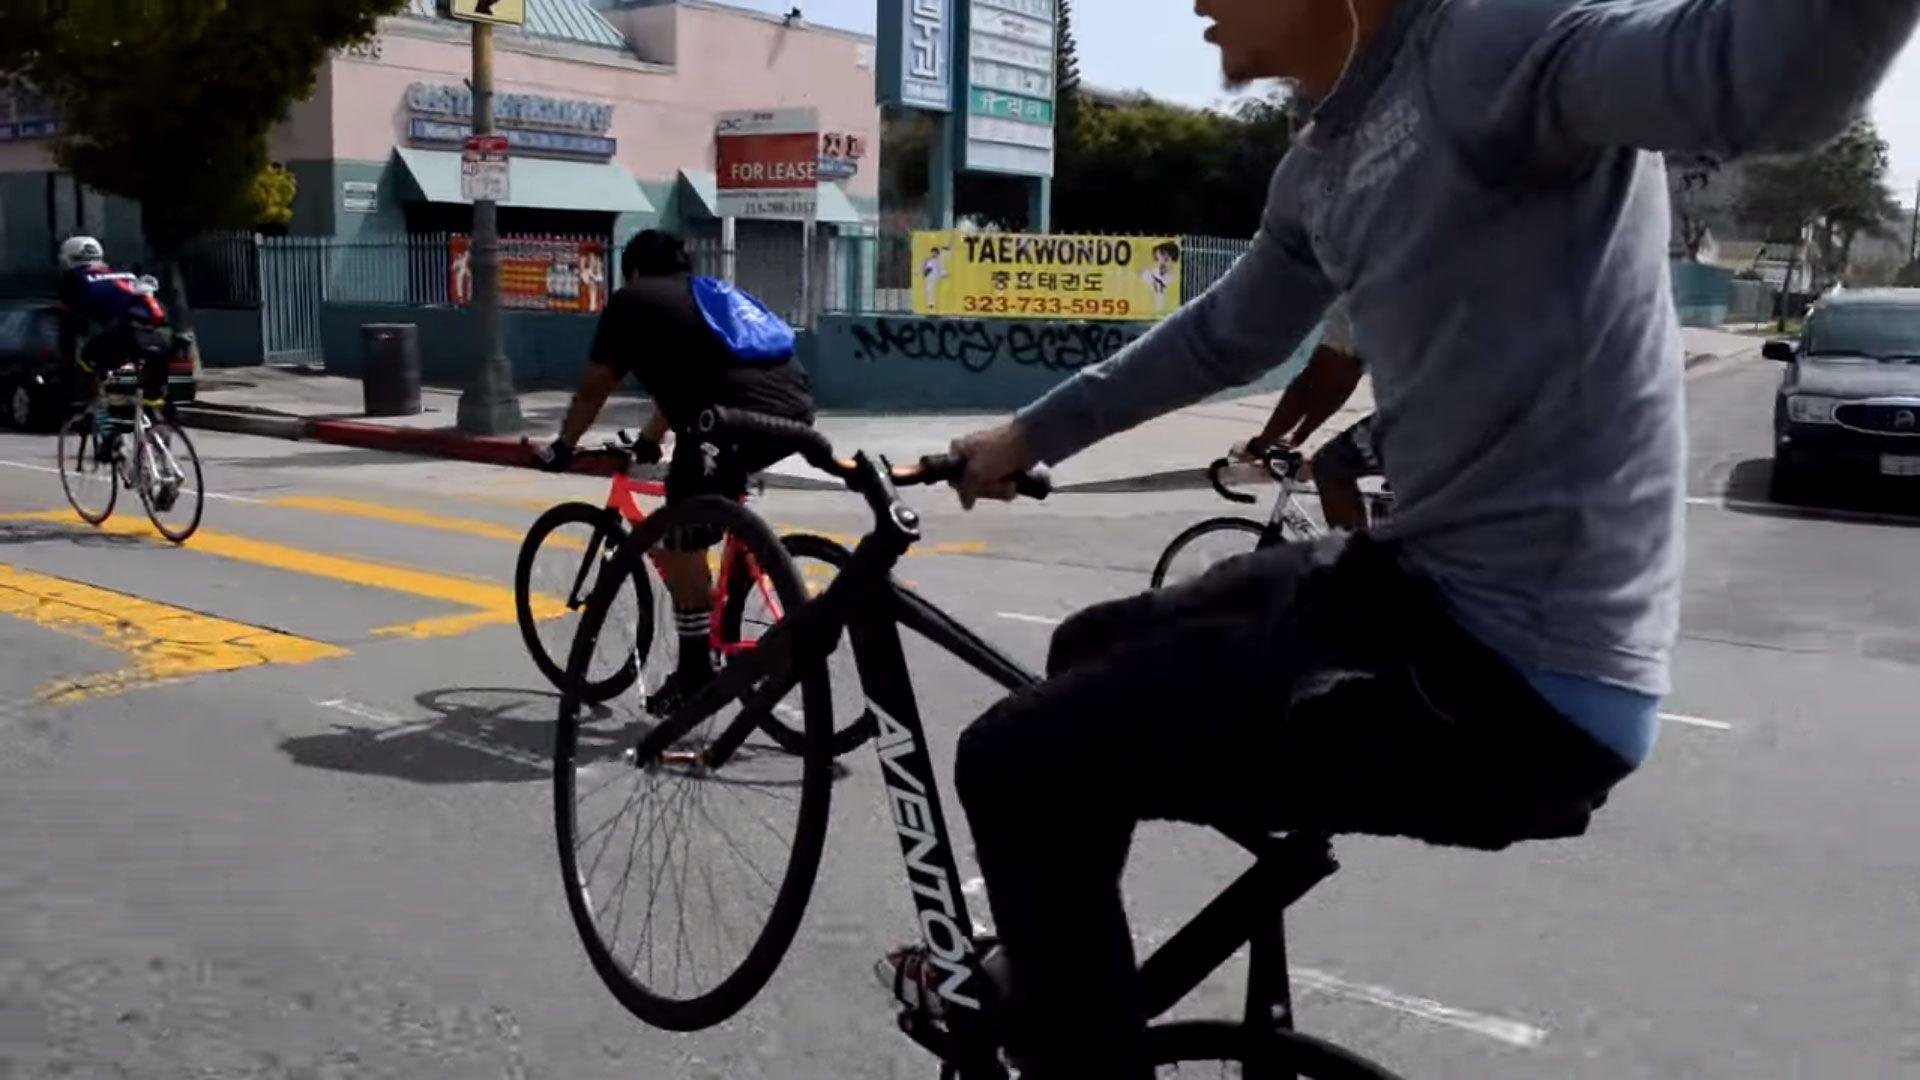 Nouvelle vidéo urbaine N.W.F. Fixie Goons DTLA | Fixie Singlespeed, infos vélo fixie, pignon fixe, singlespeed.